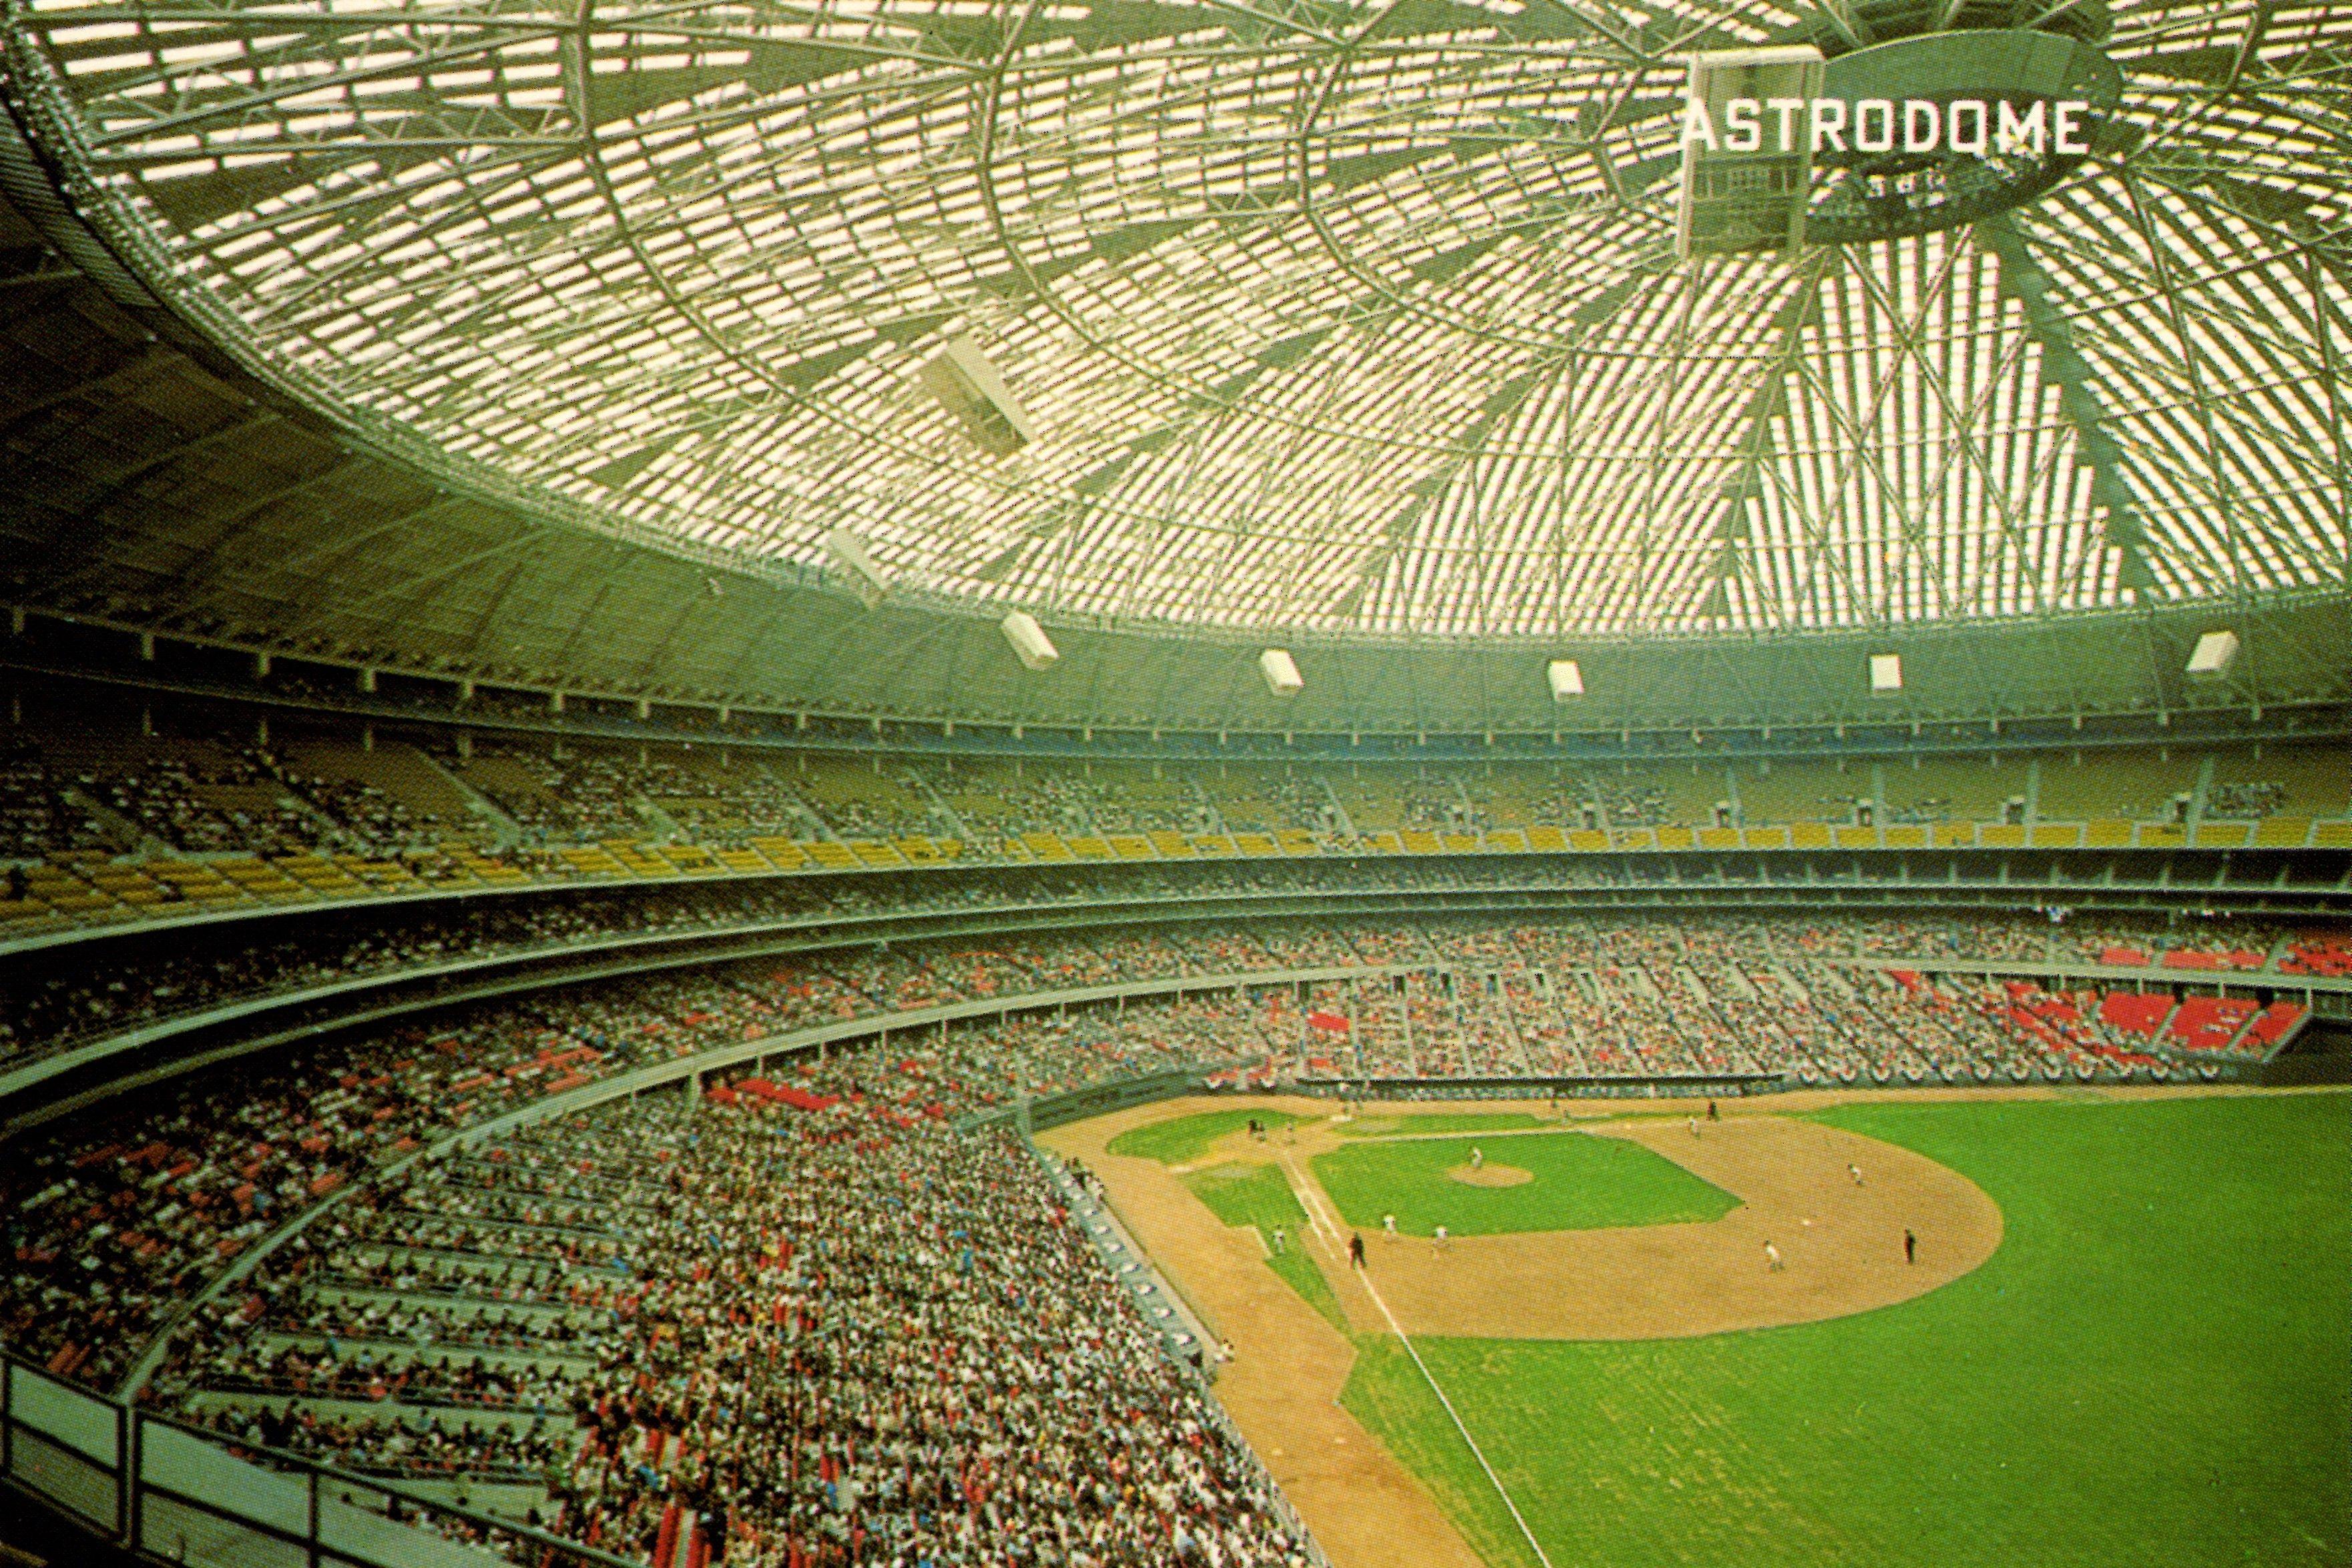 My Collection Deckle Ac 43 A 1967 Astrocard Mlb Stadiums Baseball Stadium City Photo